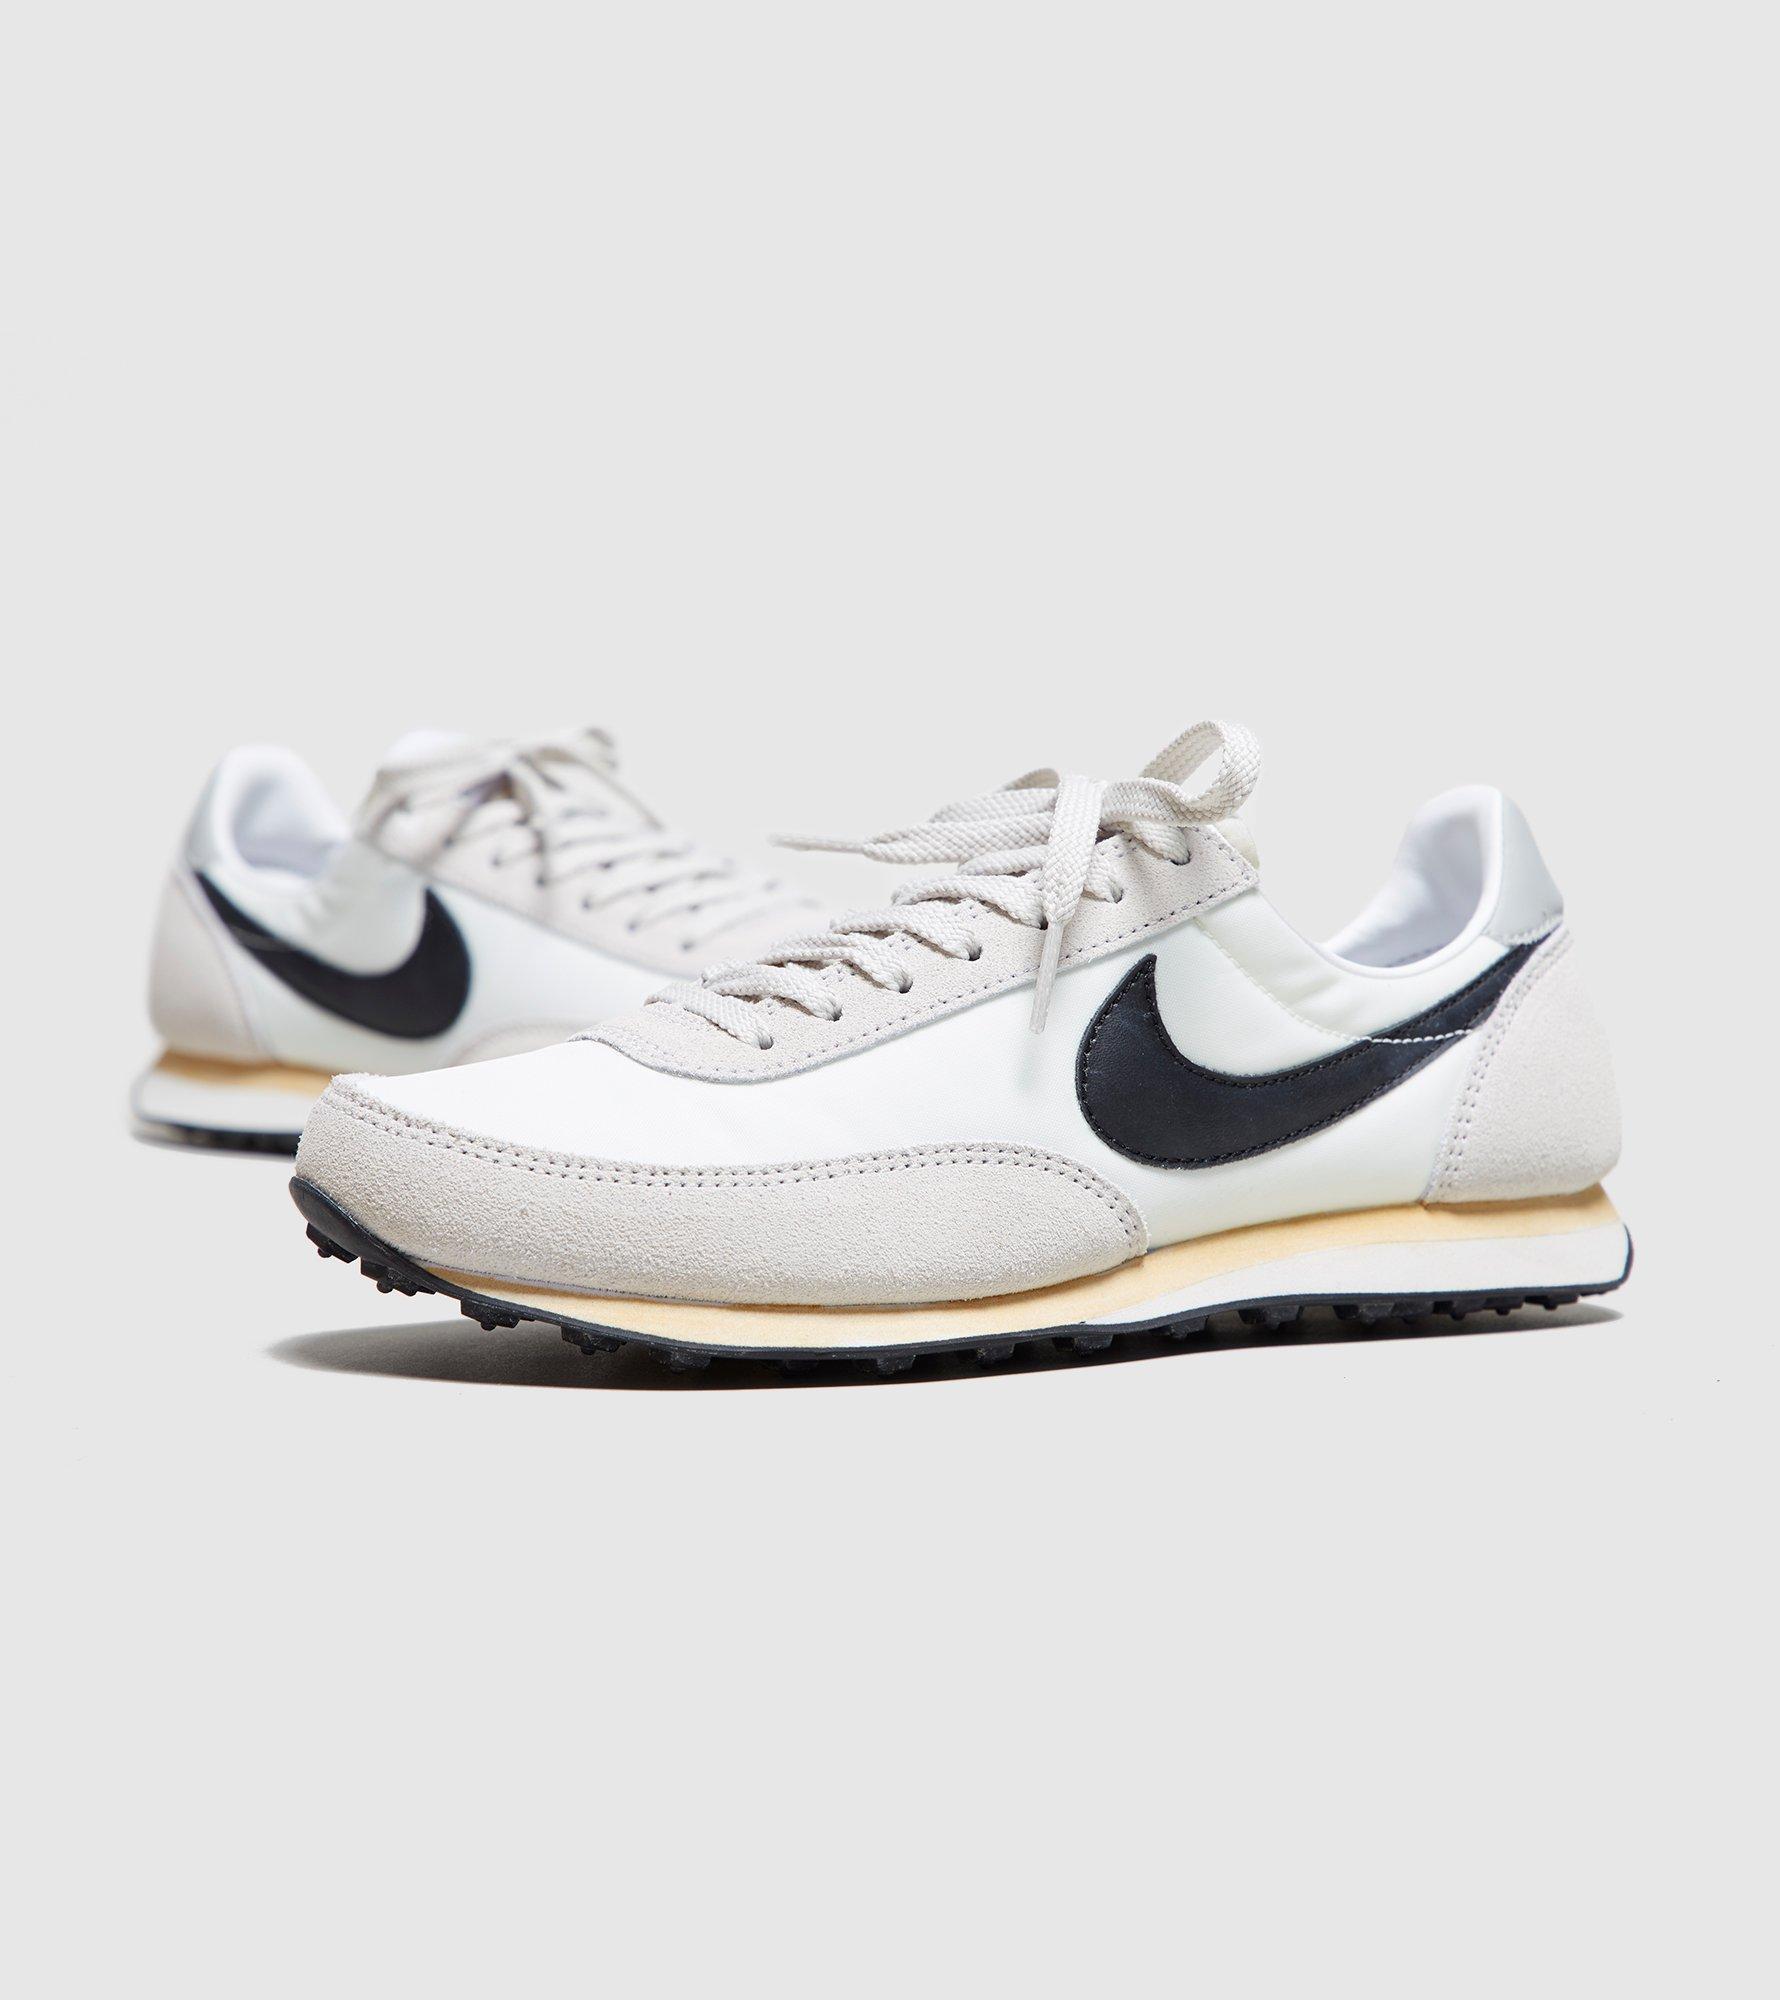 203cedad370e7 Lyst - Nike Elite Women s - Size  Exclusive in White